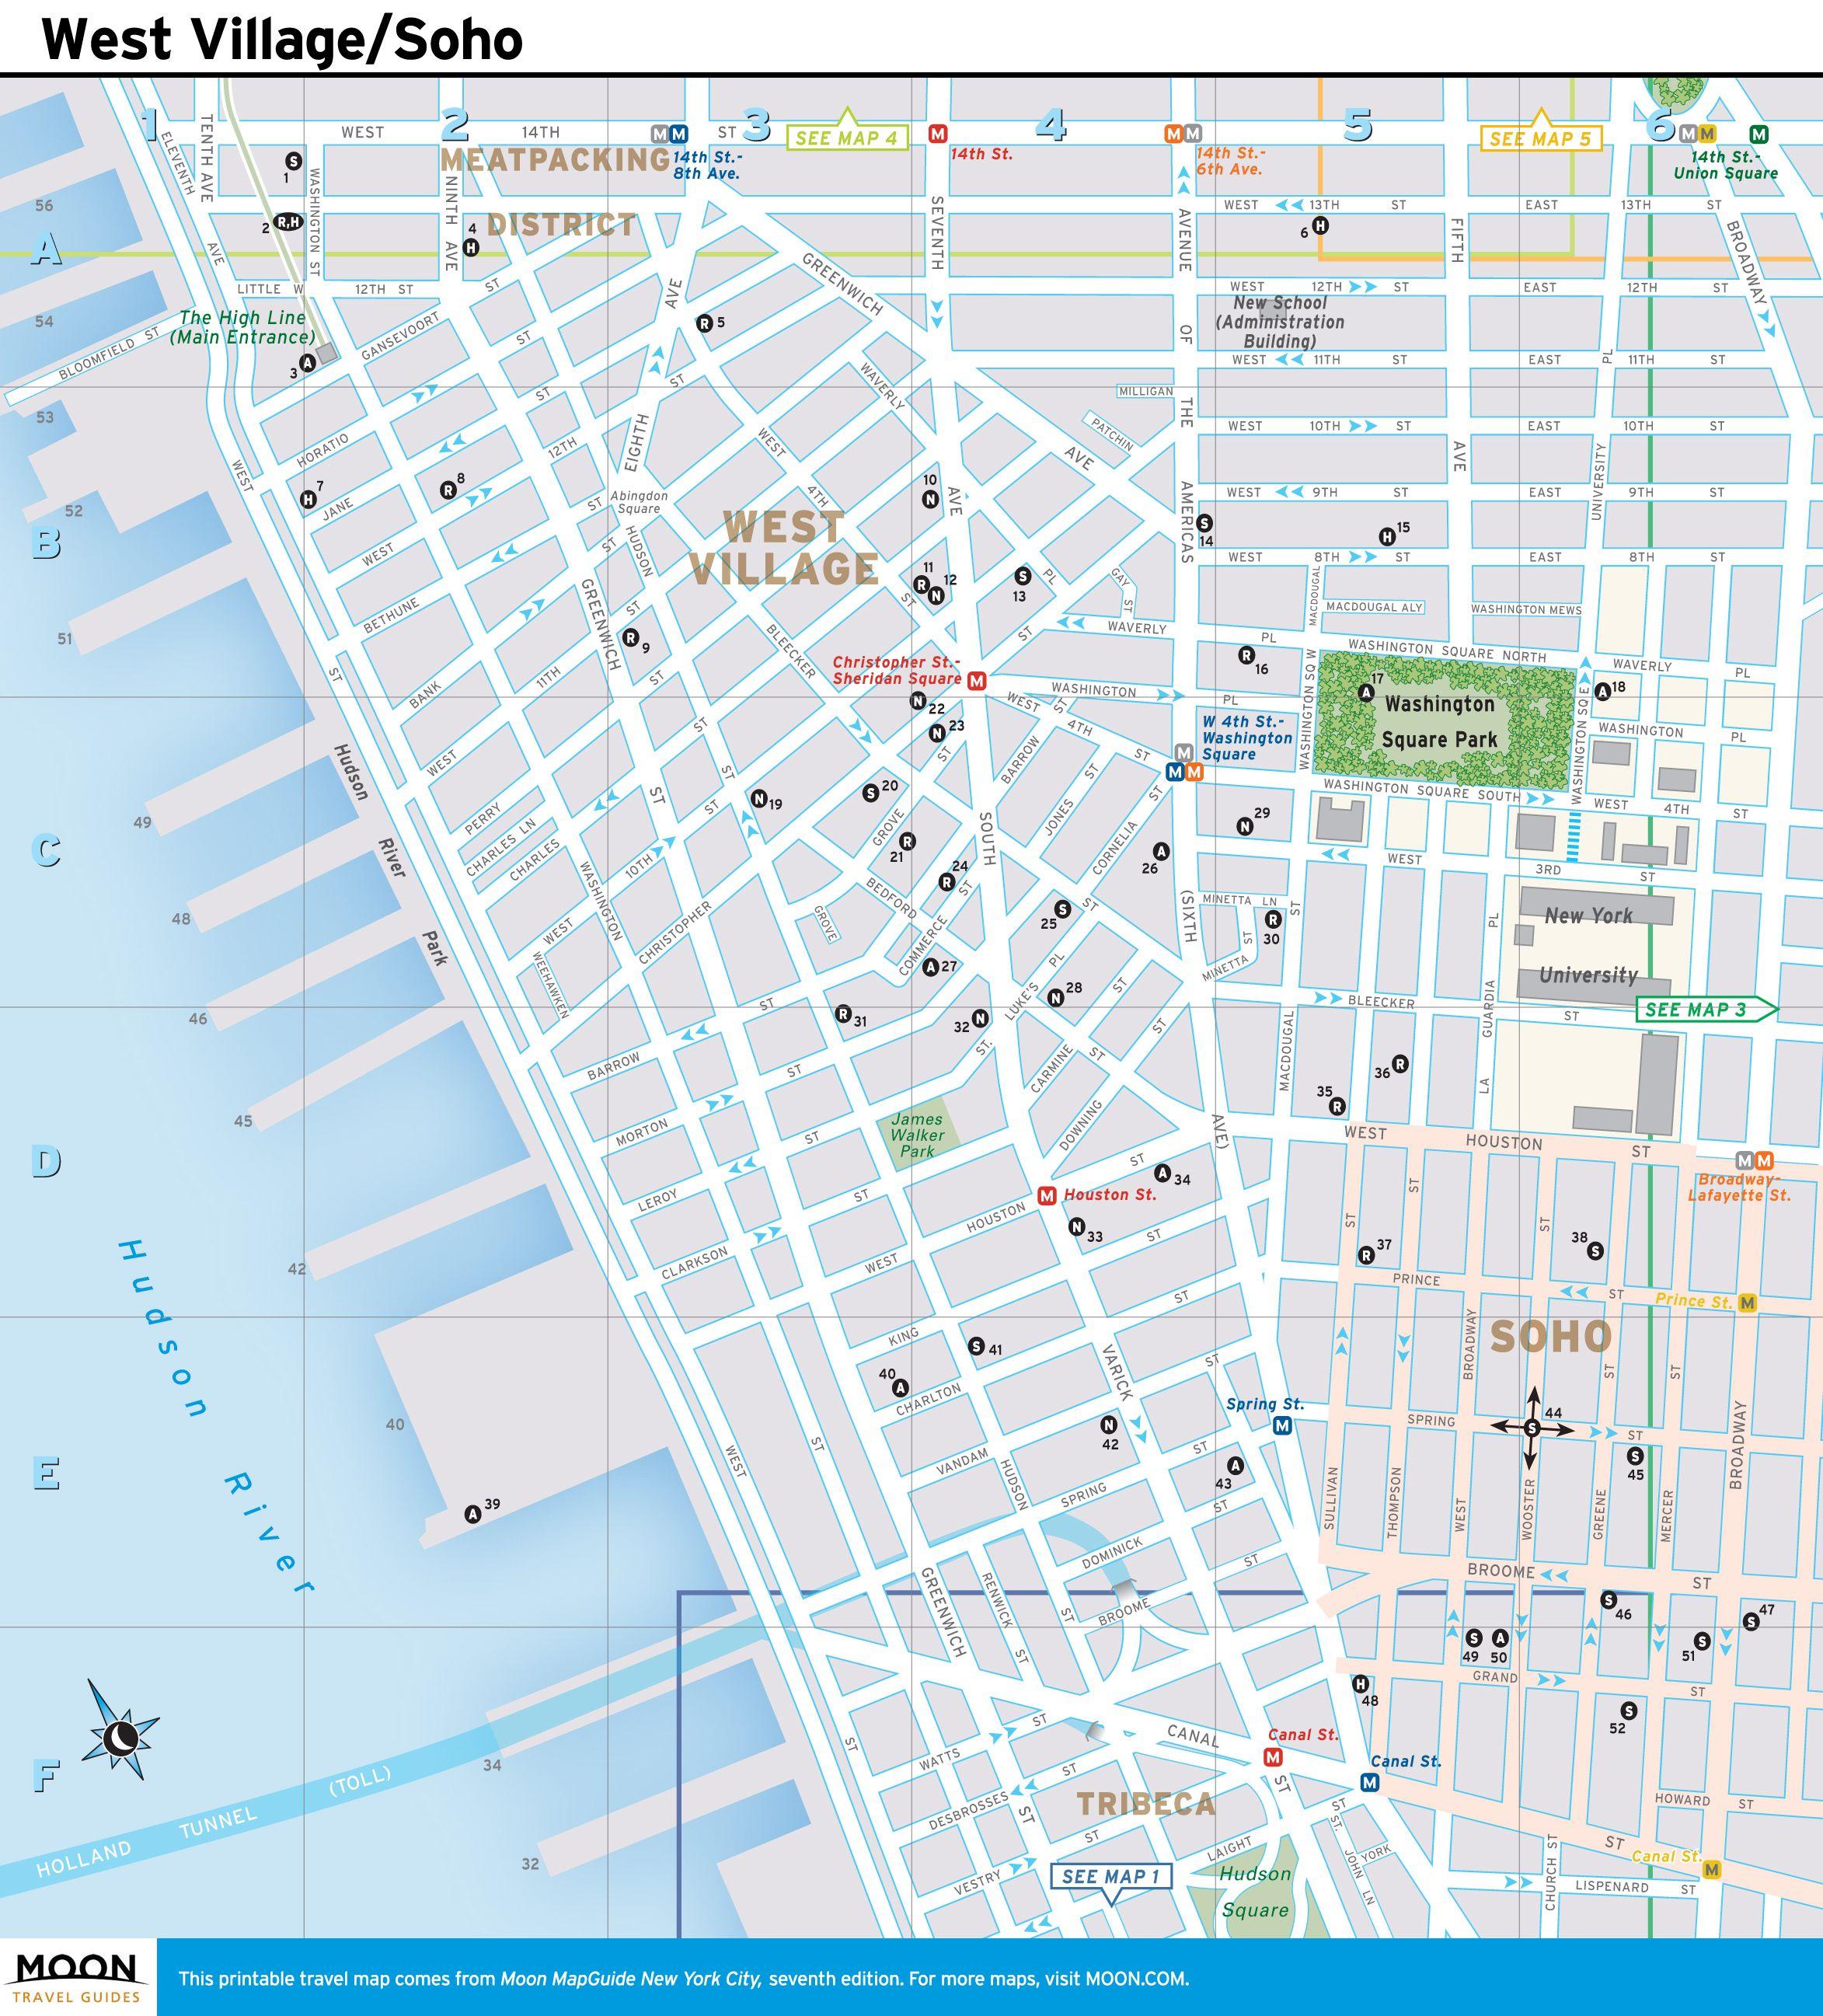 Map Of Soho New York.New York City Map West Village And Soho New York City Map West